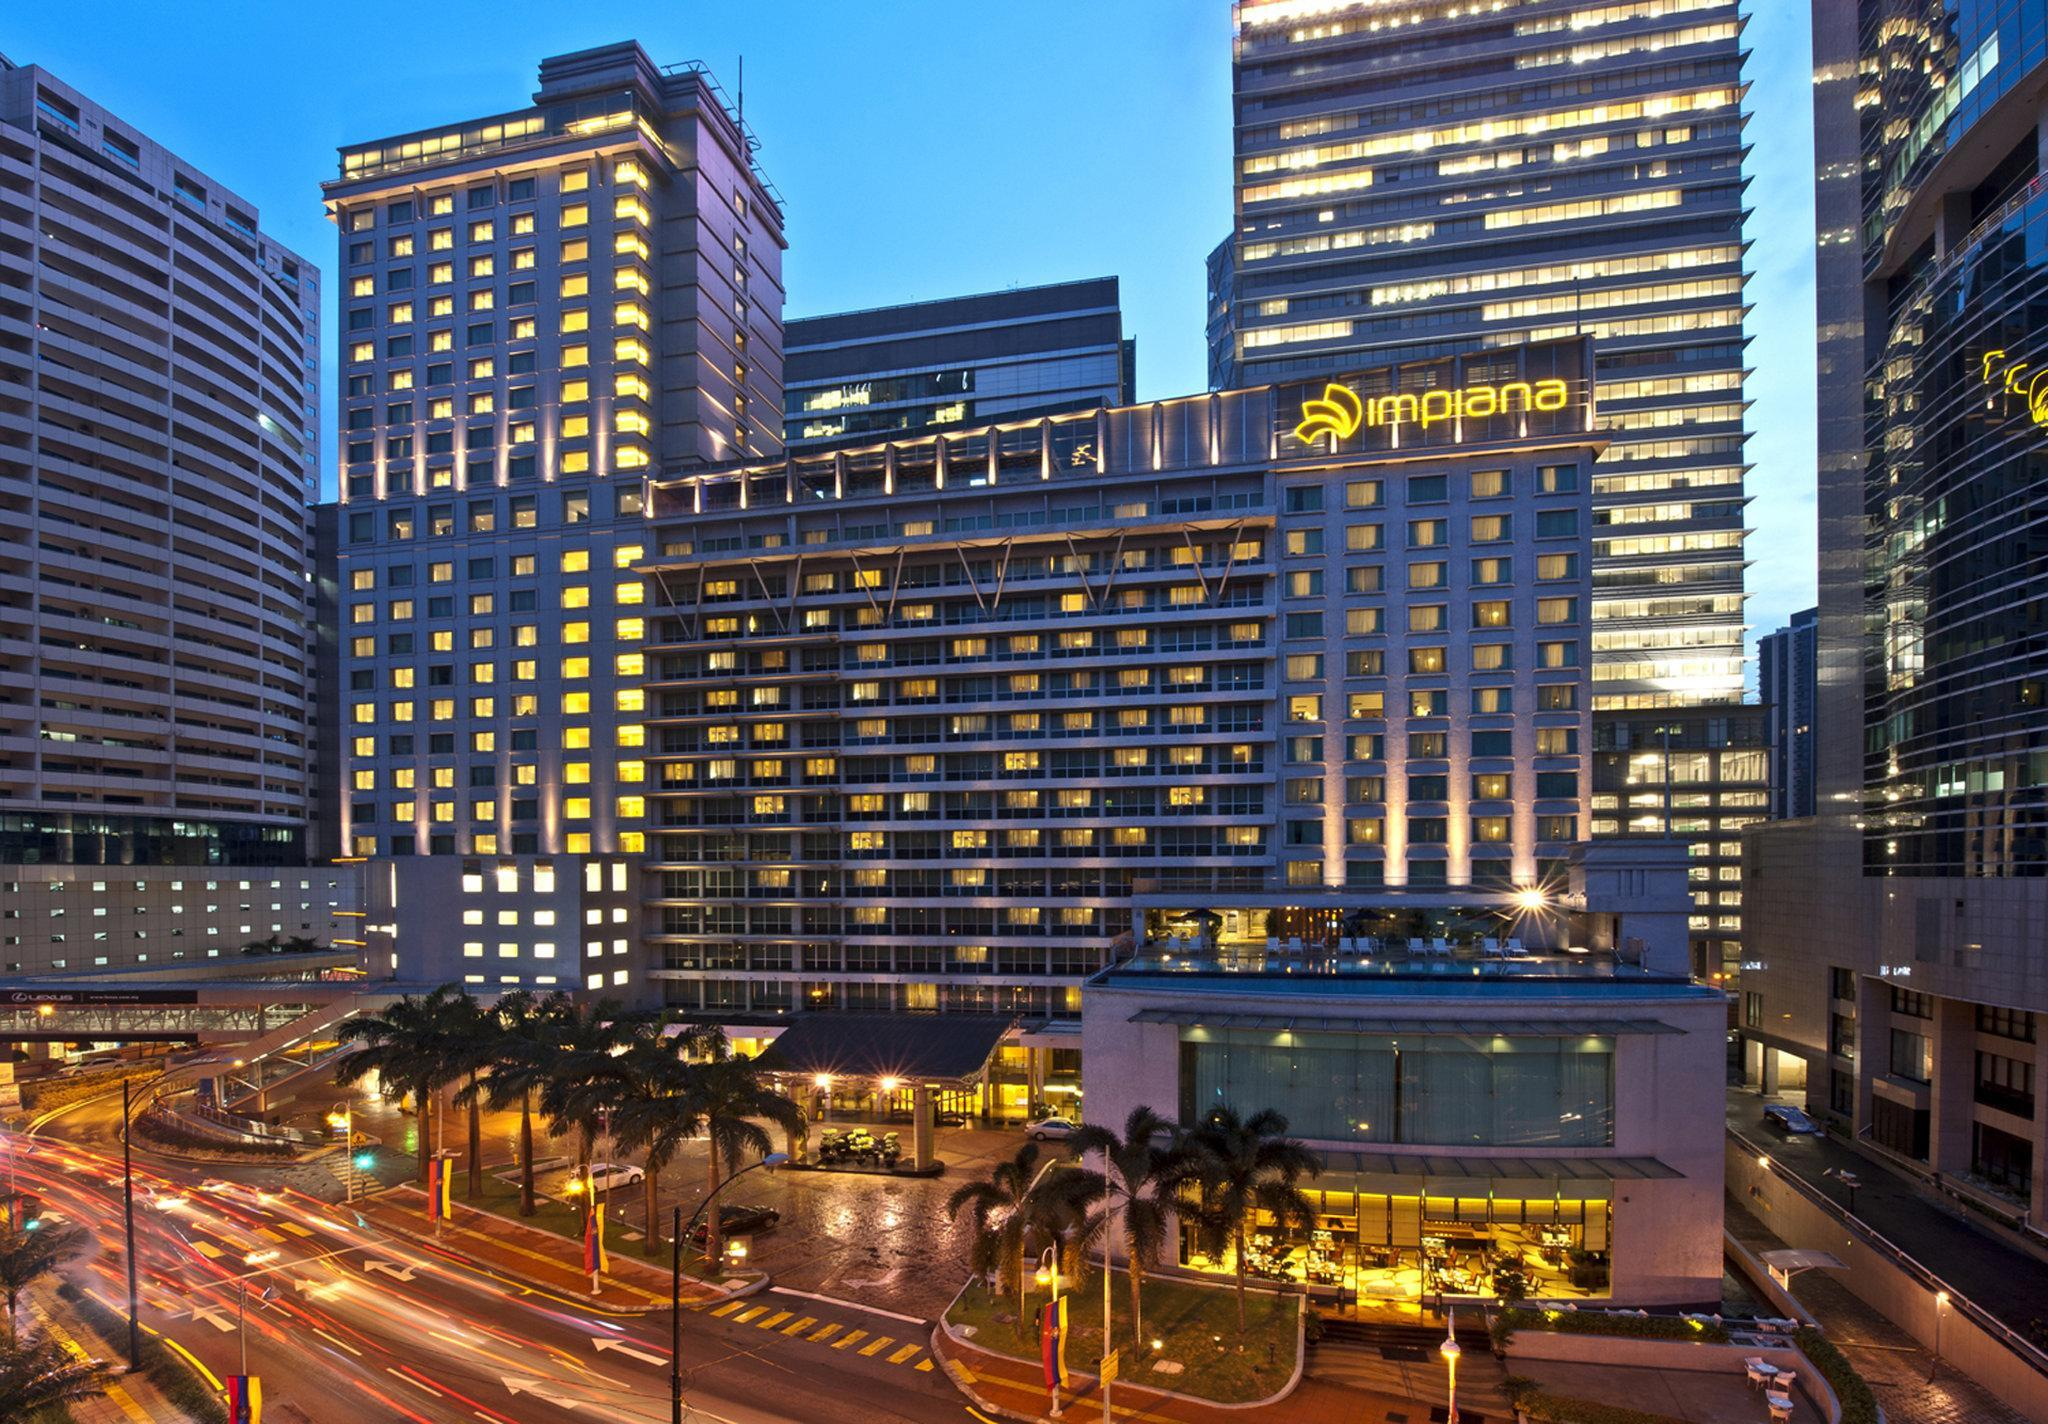 Impiana KLCC Hotel & Spa, Kuala Lumpur